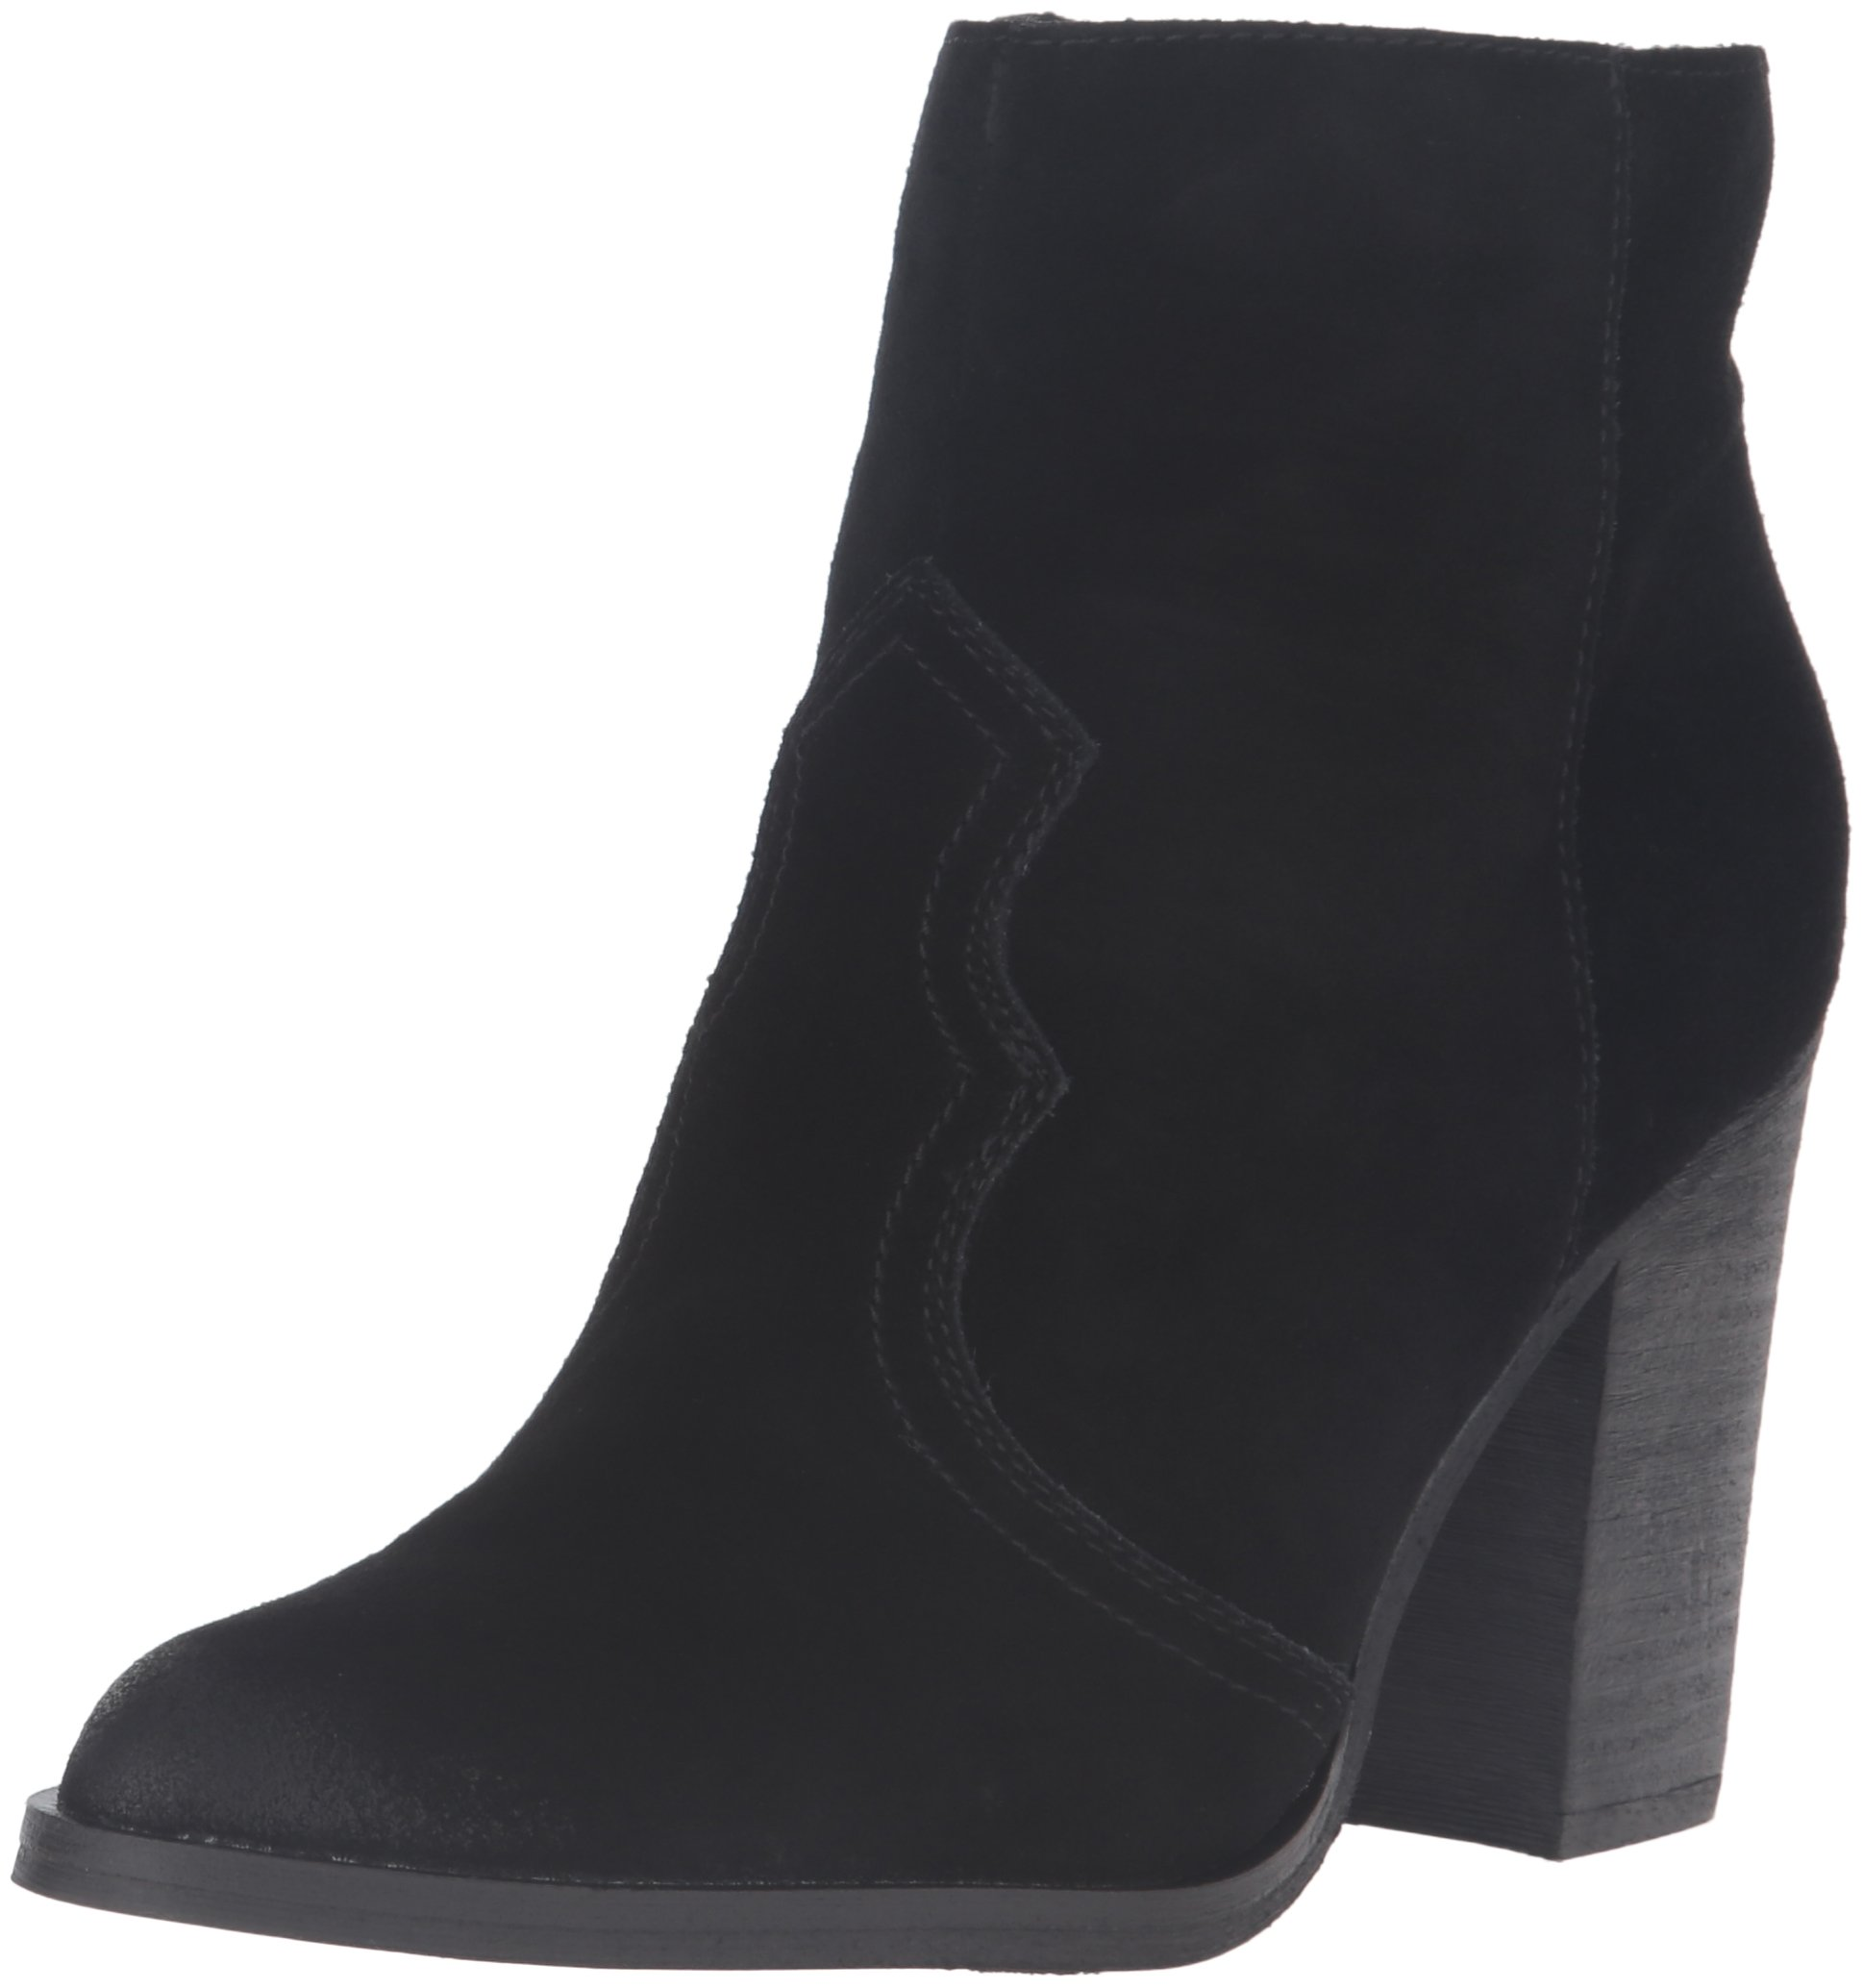 Dolce Vita Women's Caillin Ankle Bootie,Black,8.5 M US